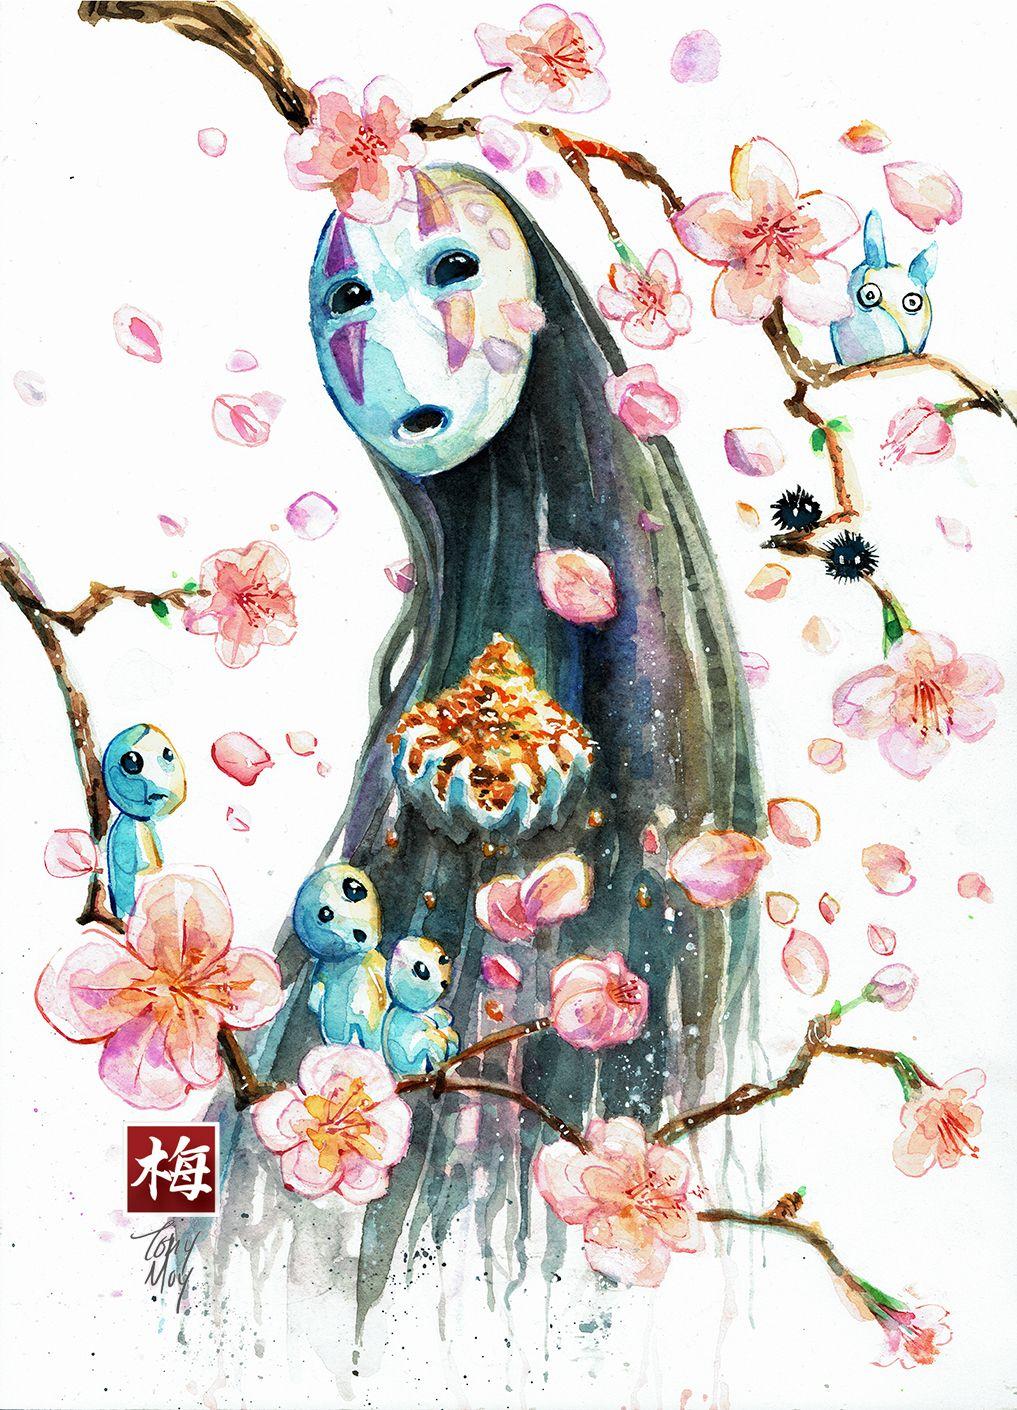 Sakura No Face Friends Studio Ghibli Watercolor Print Sakura Art Ghibli Artwork Ghibli Art